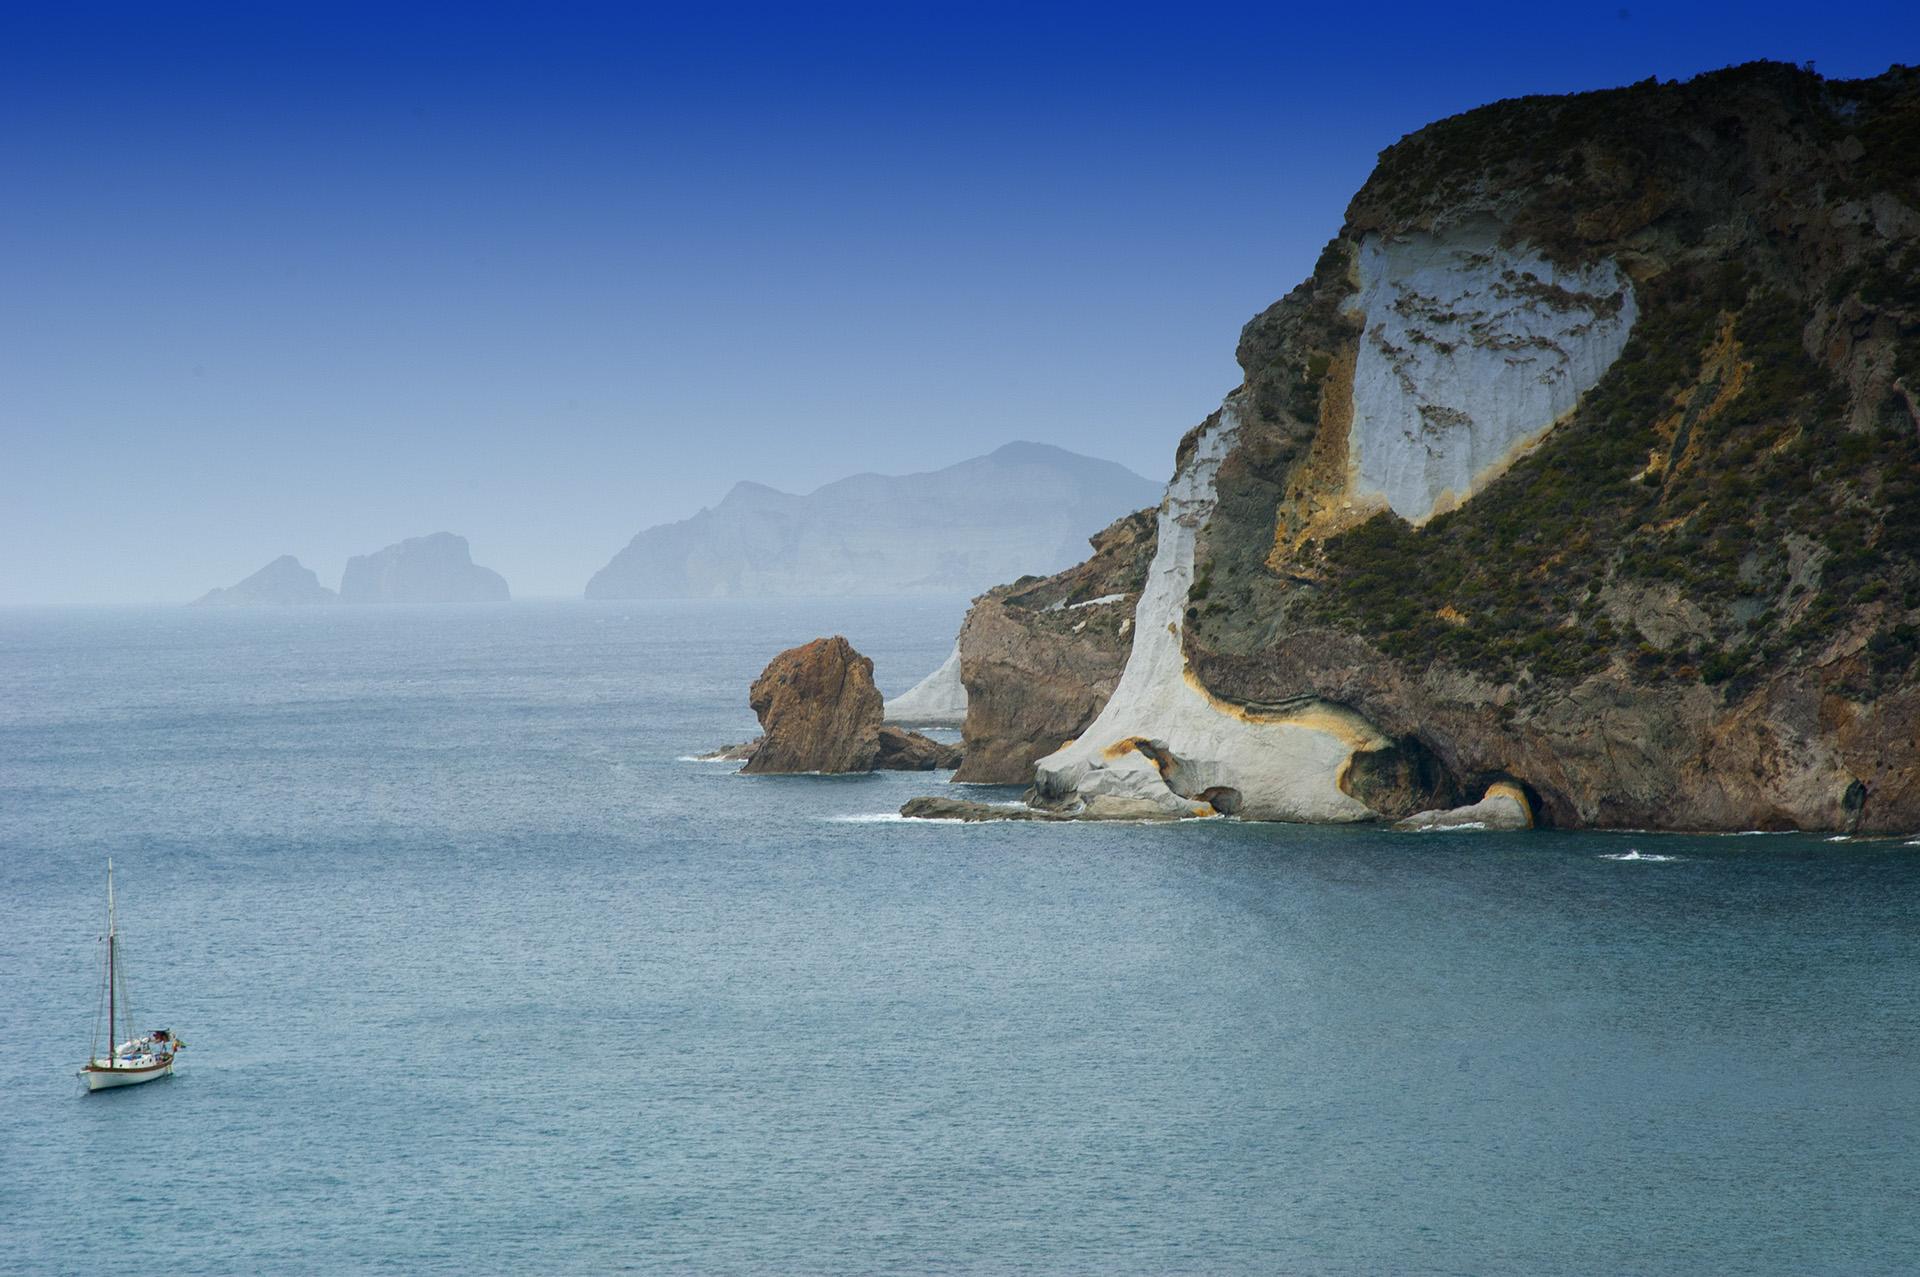 isole ponziane